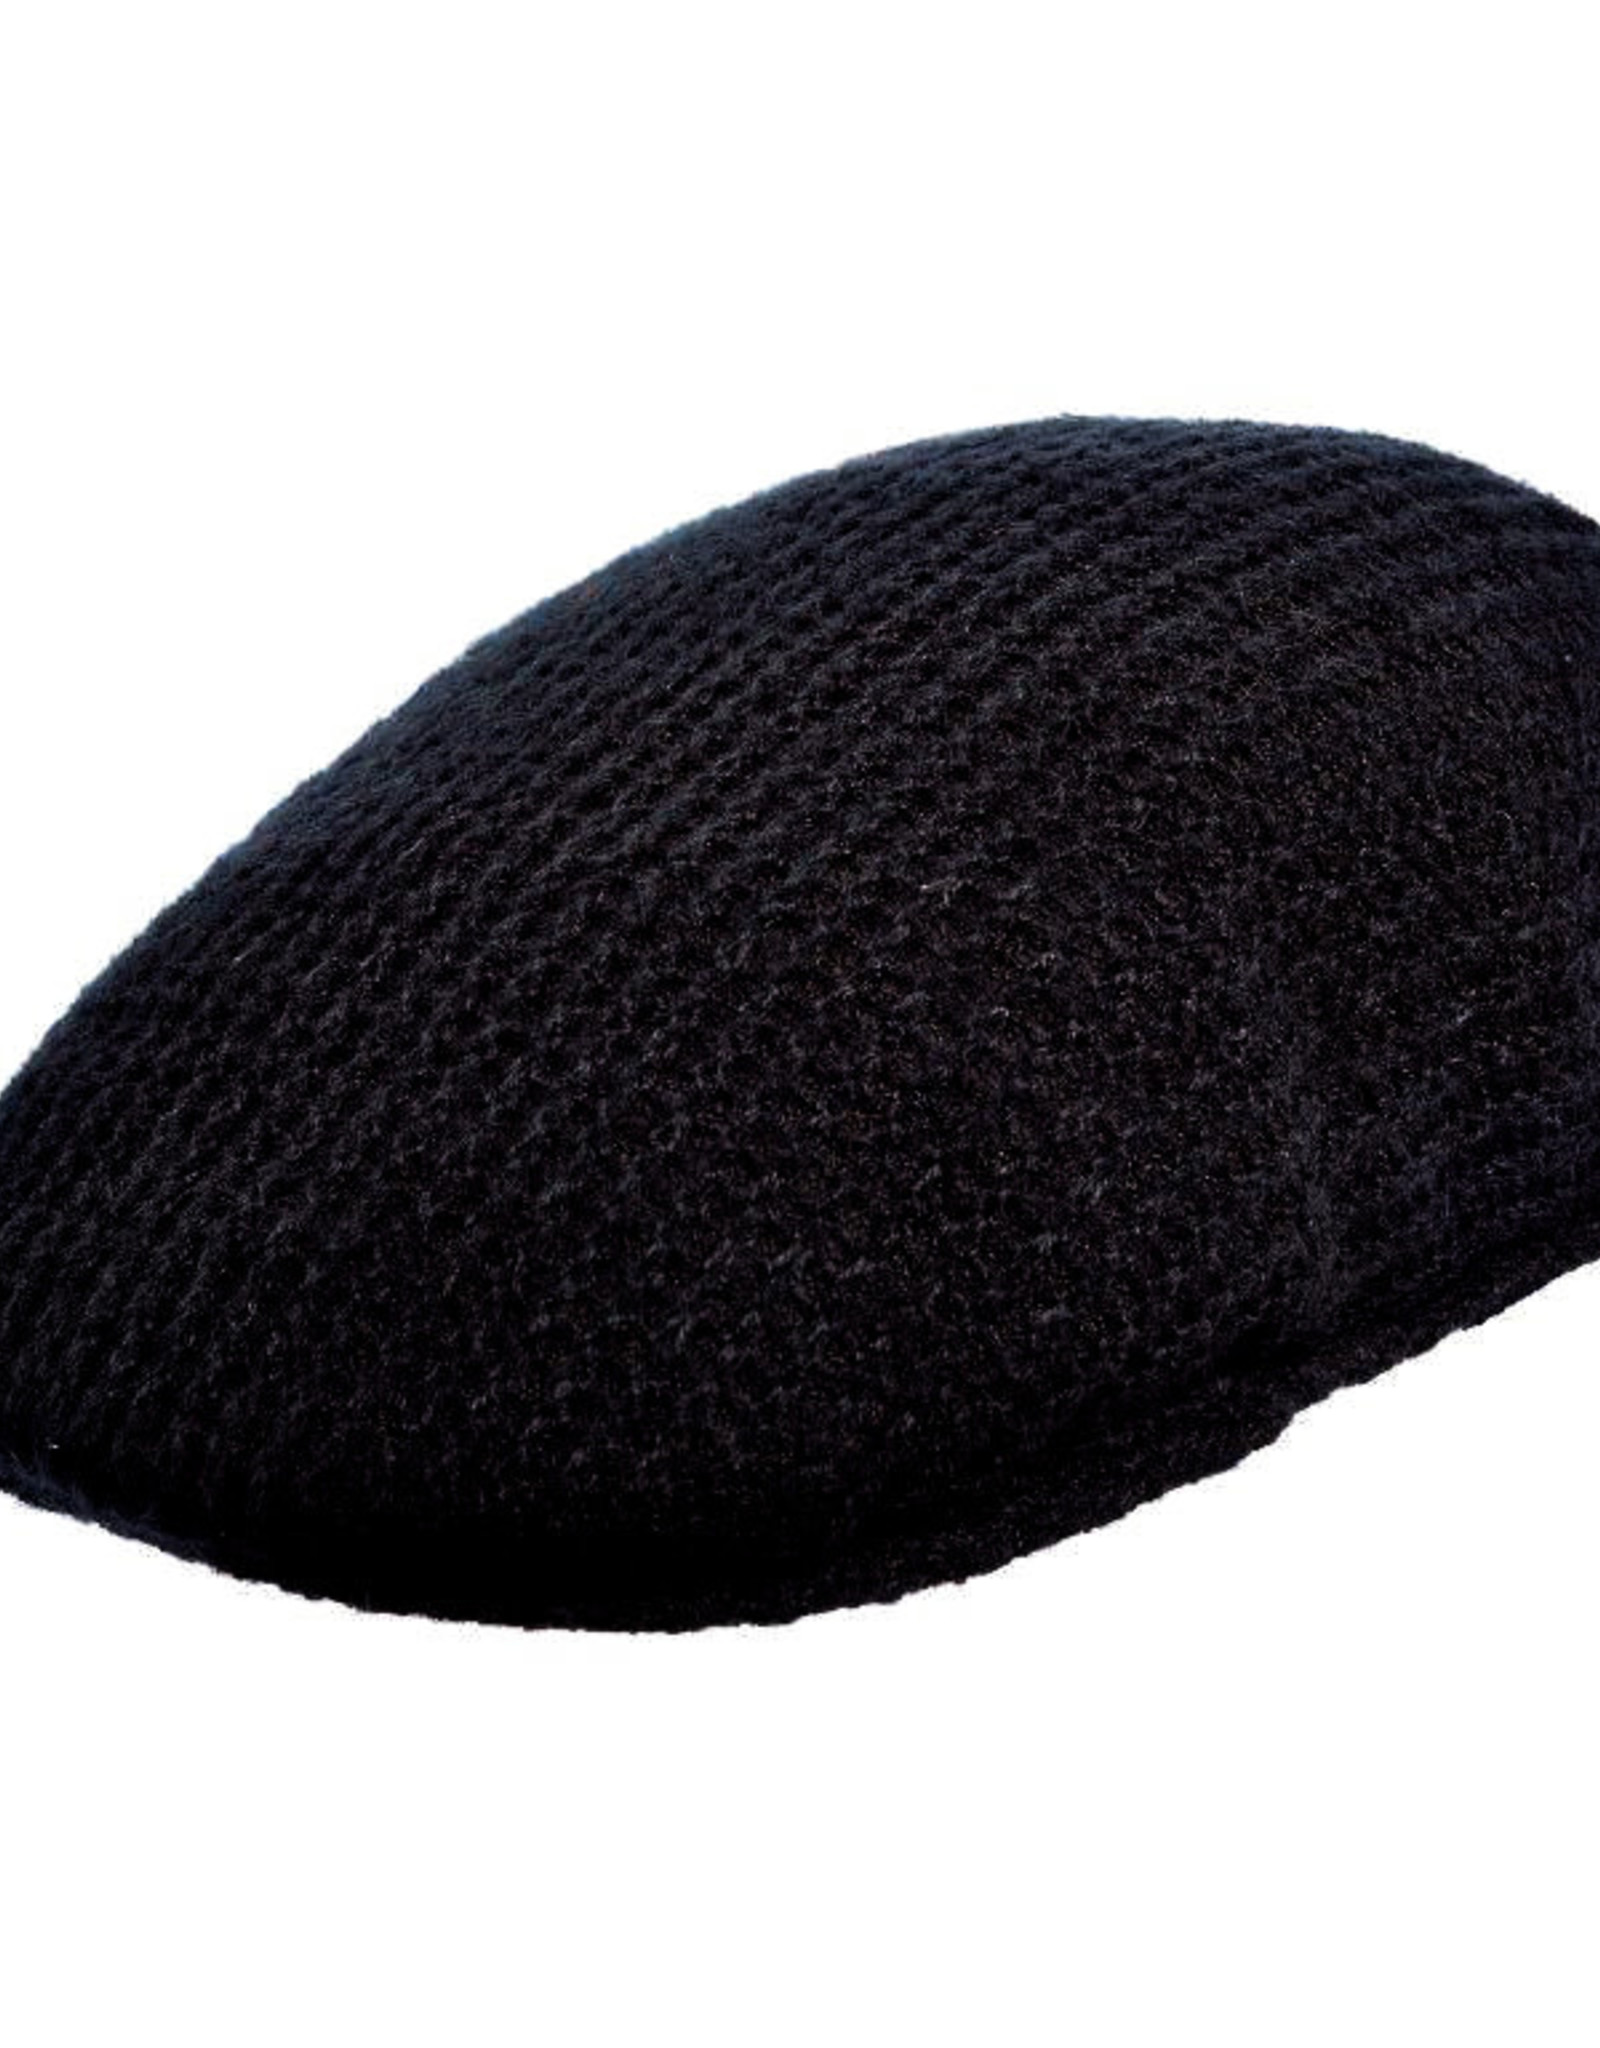 Stacy Adams Hat Stacy Adams FOLWELL Knit Wool Black